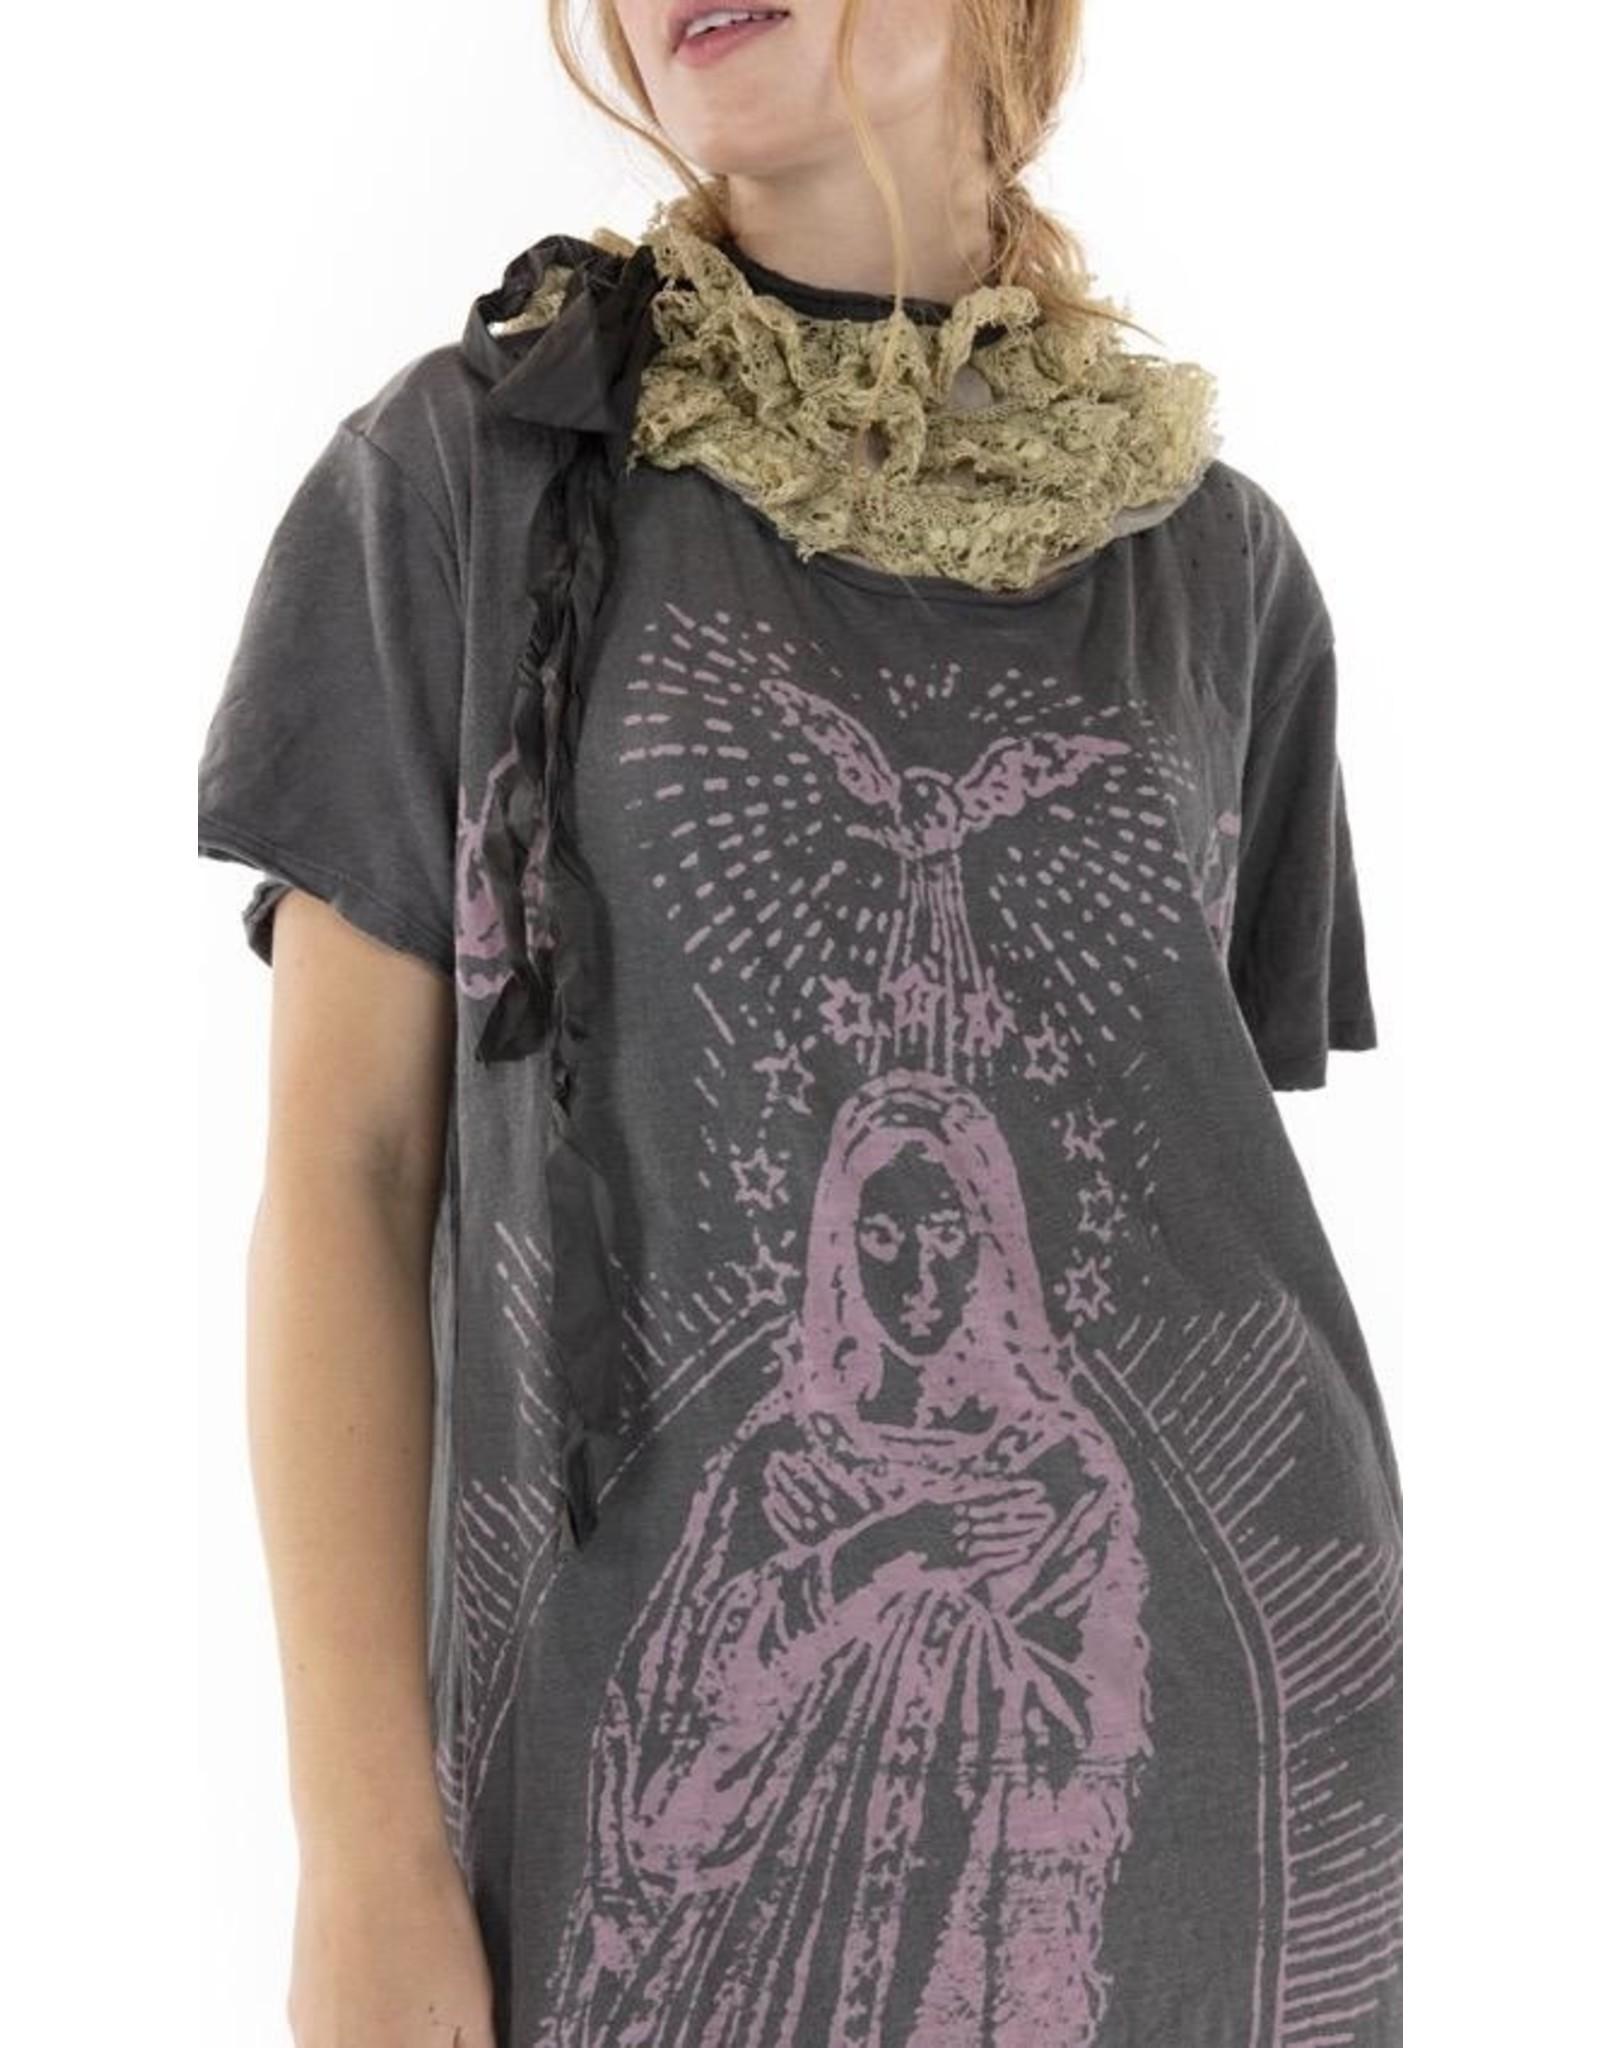 Magnolia Pearl Mary of Prosperity T Dress - Adore